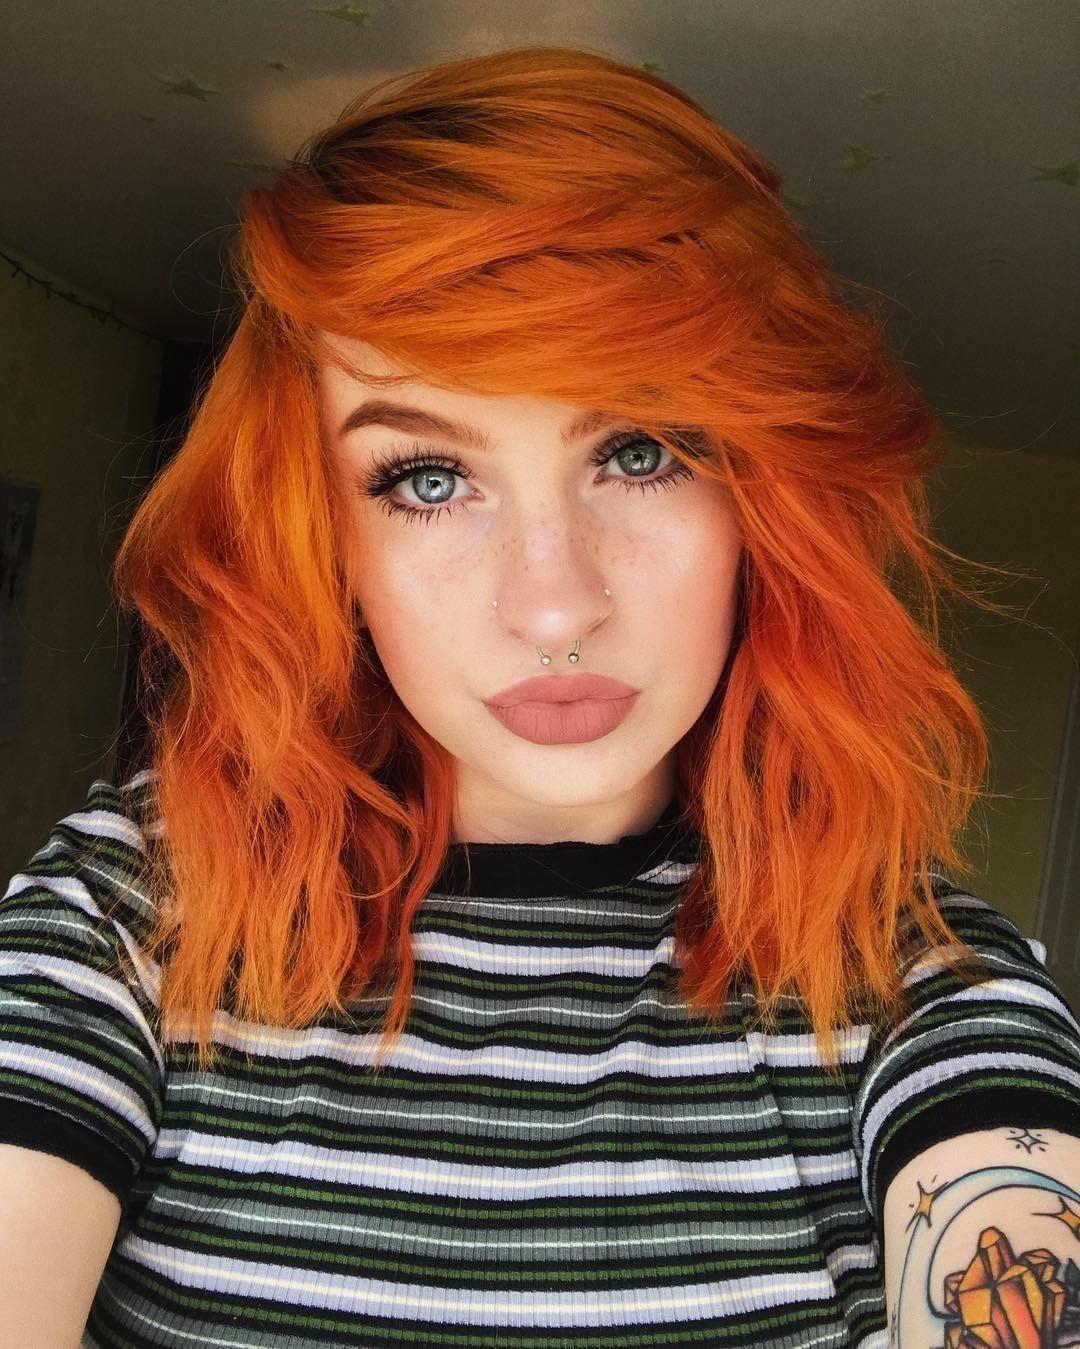 F Oxbaby Has Adorable Sunny Locks Thanks To Sunset Orange By Arctic Fox Shop Here Www Beserk Com Au Ar Hair Color Orange Orange Hair Dye Fox Hair Dye